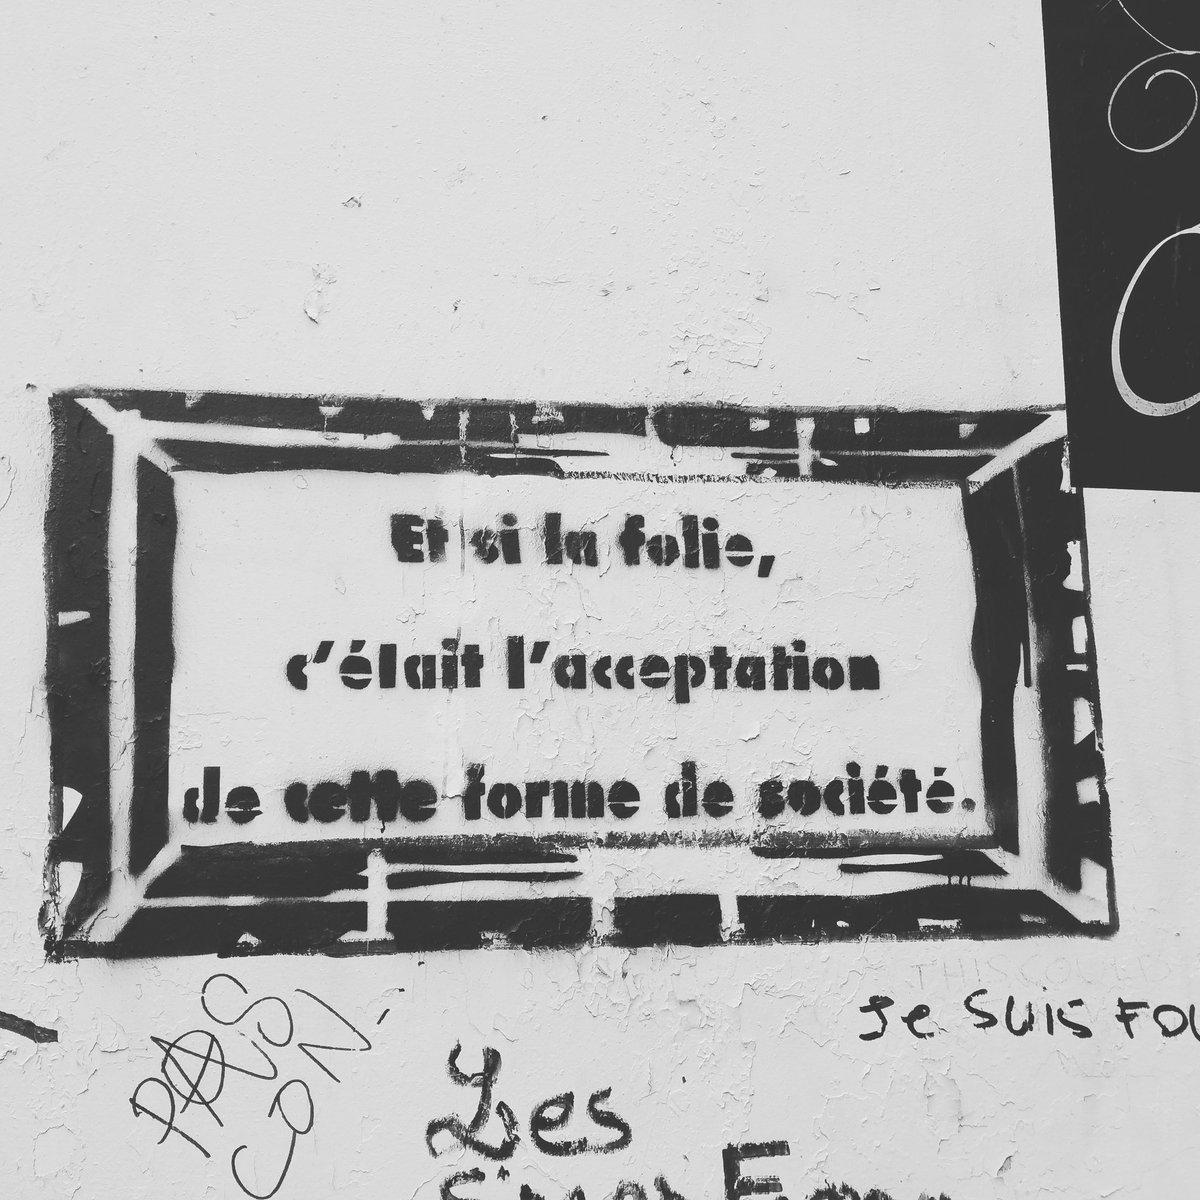 #citation # folie #socialmedia<br>http://pic.twitter.com/xFxIJSLG7w